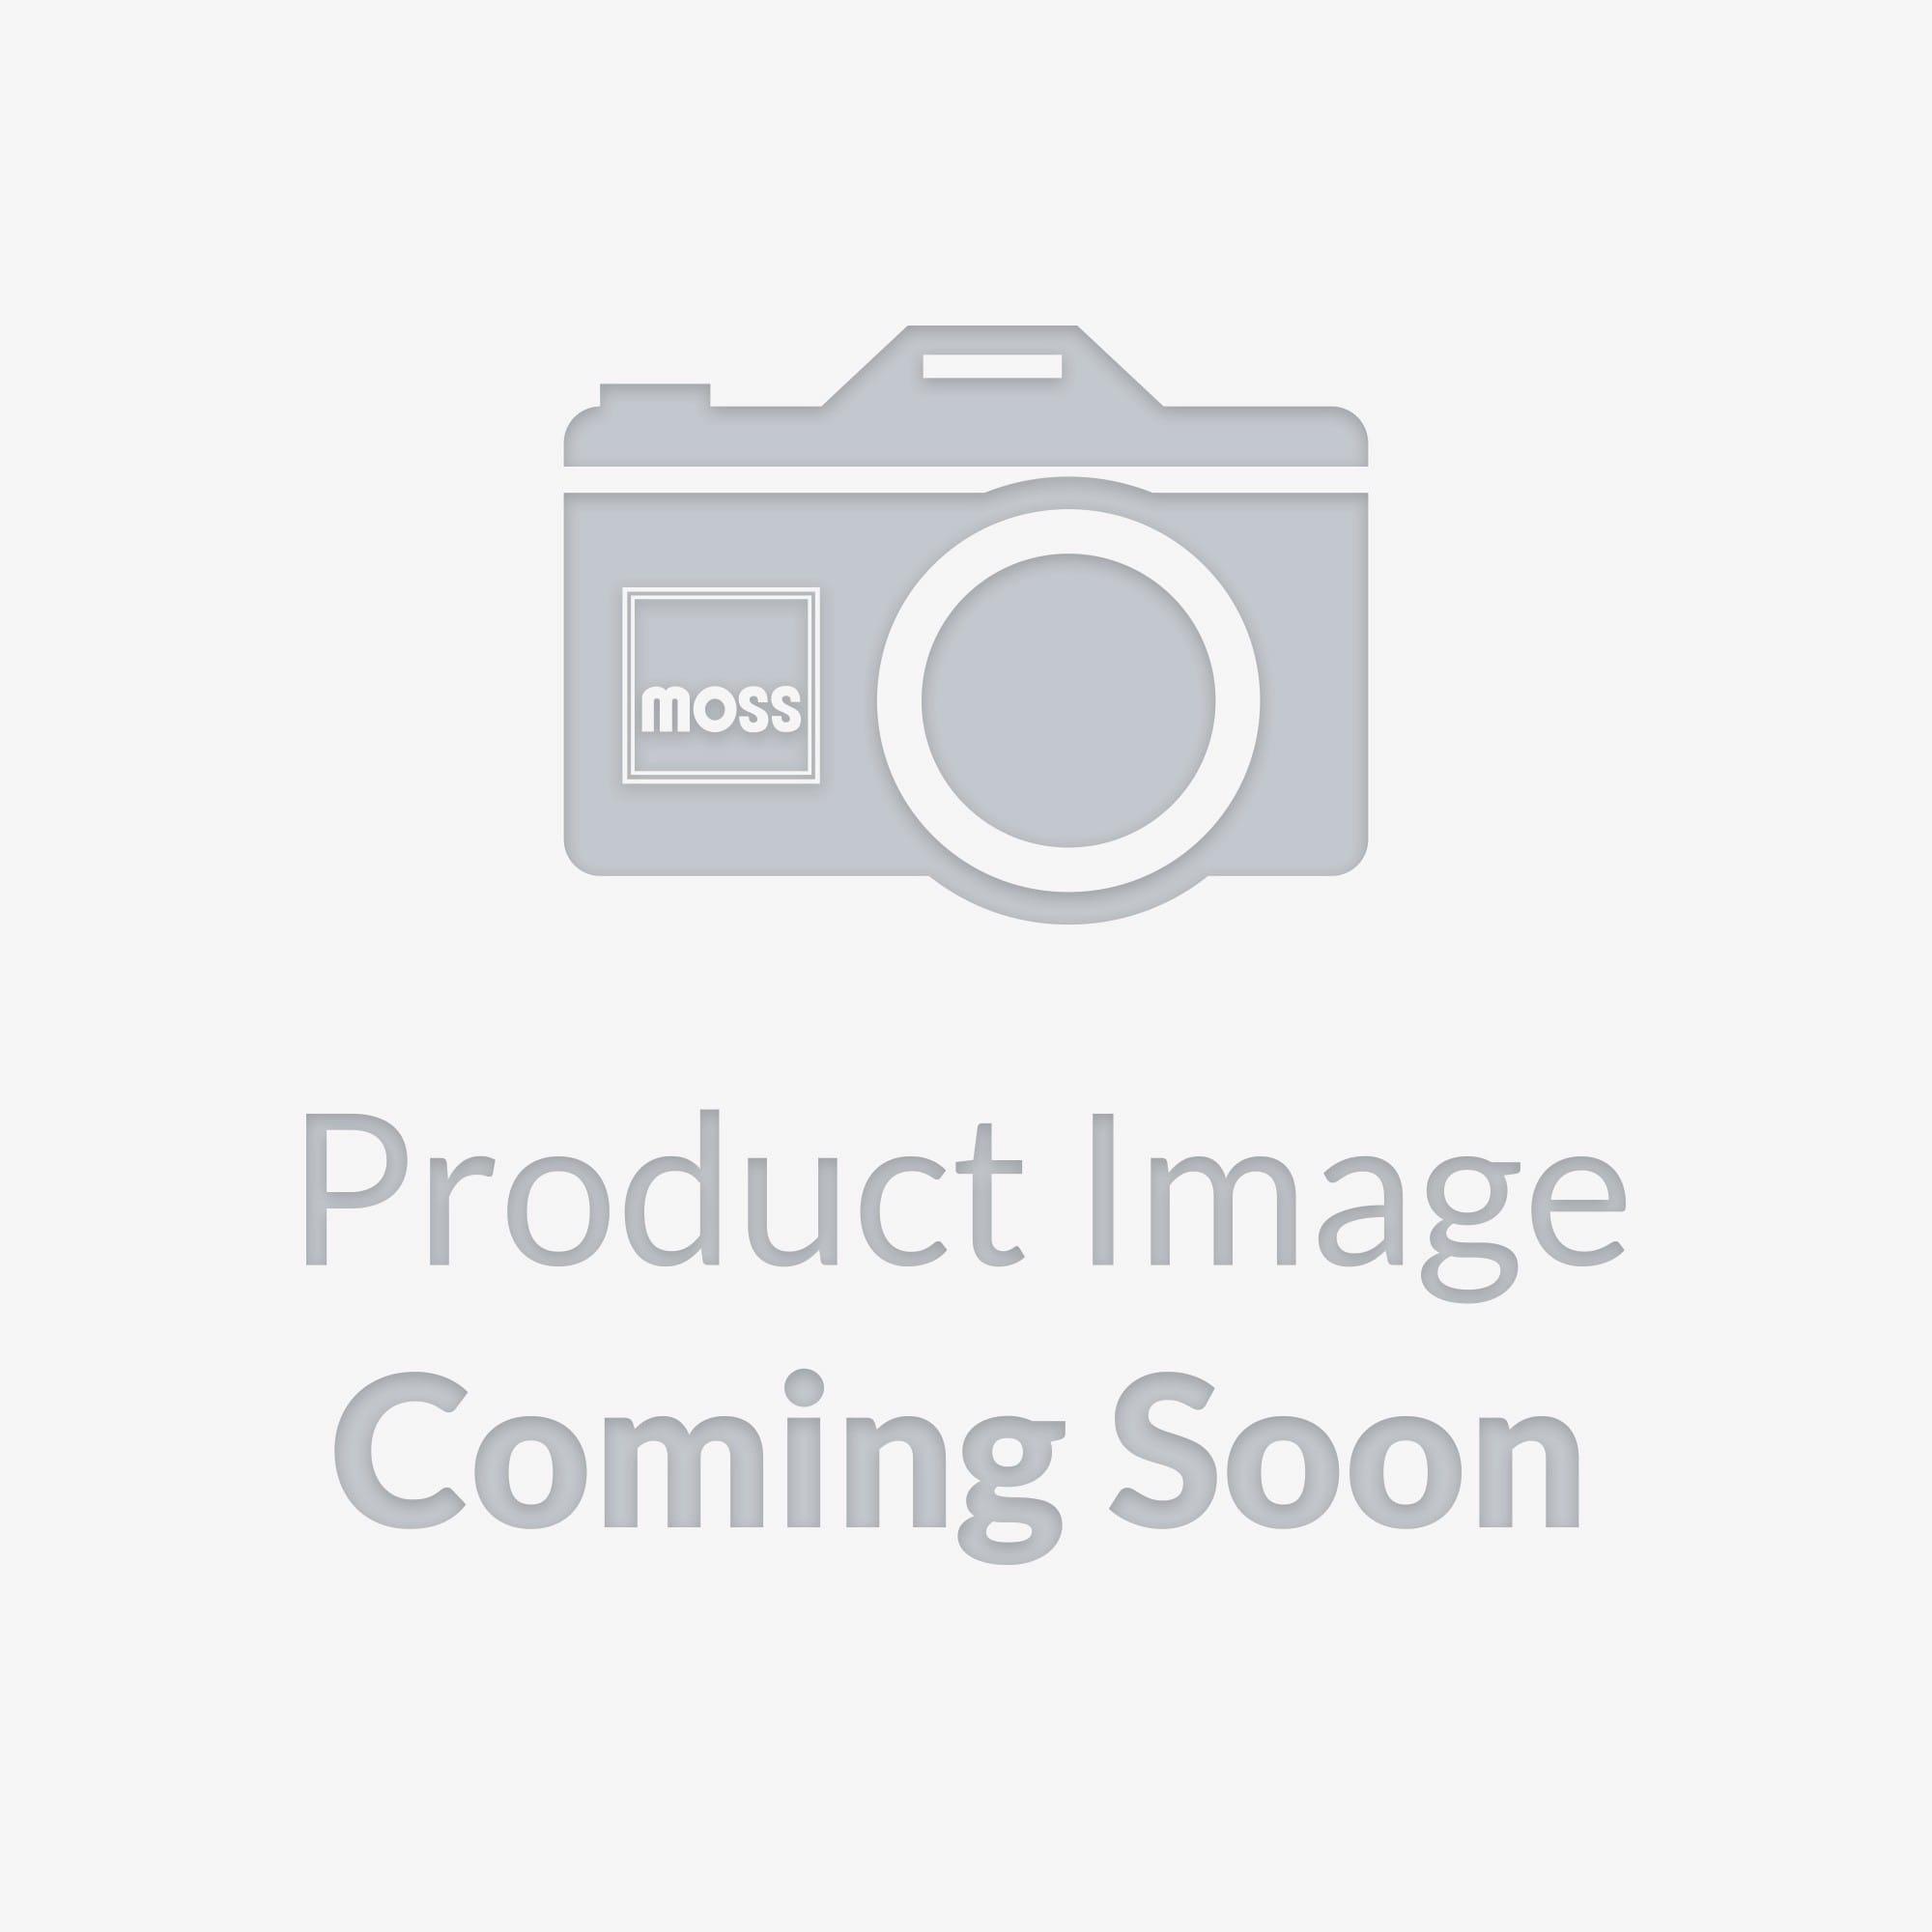 Mini Cooper 60th Anniversary T Shirt Art Collectibles